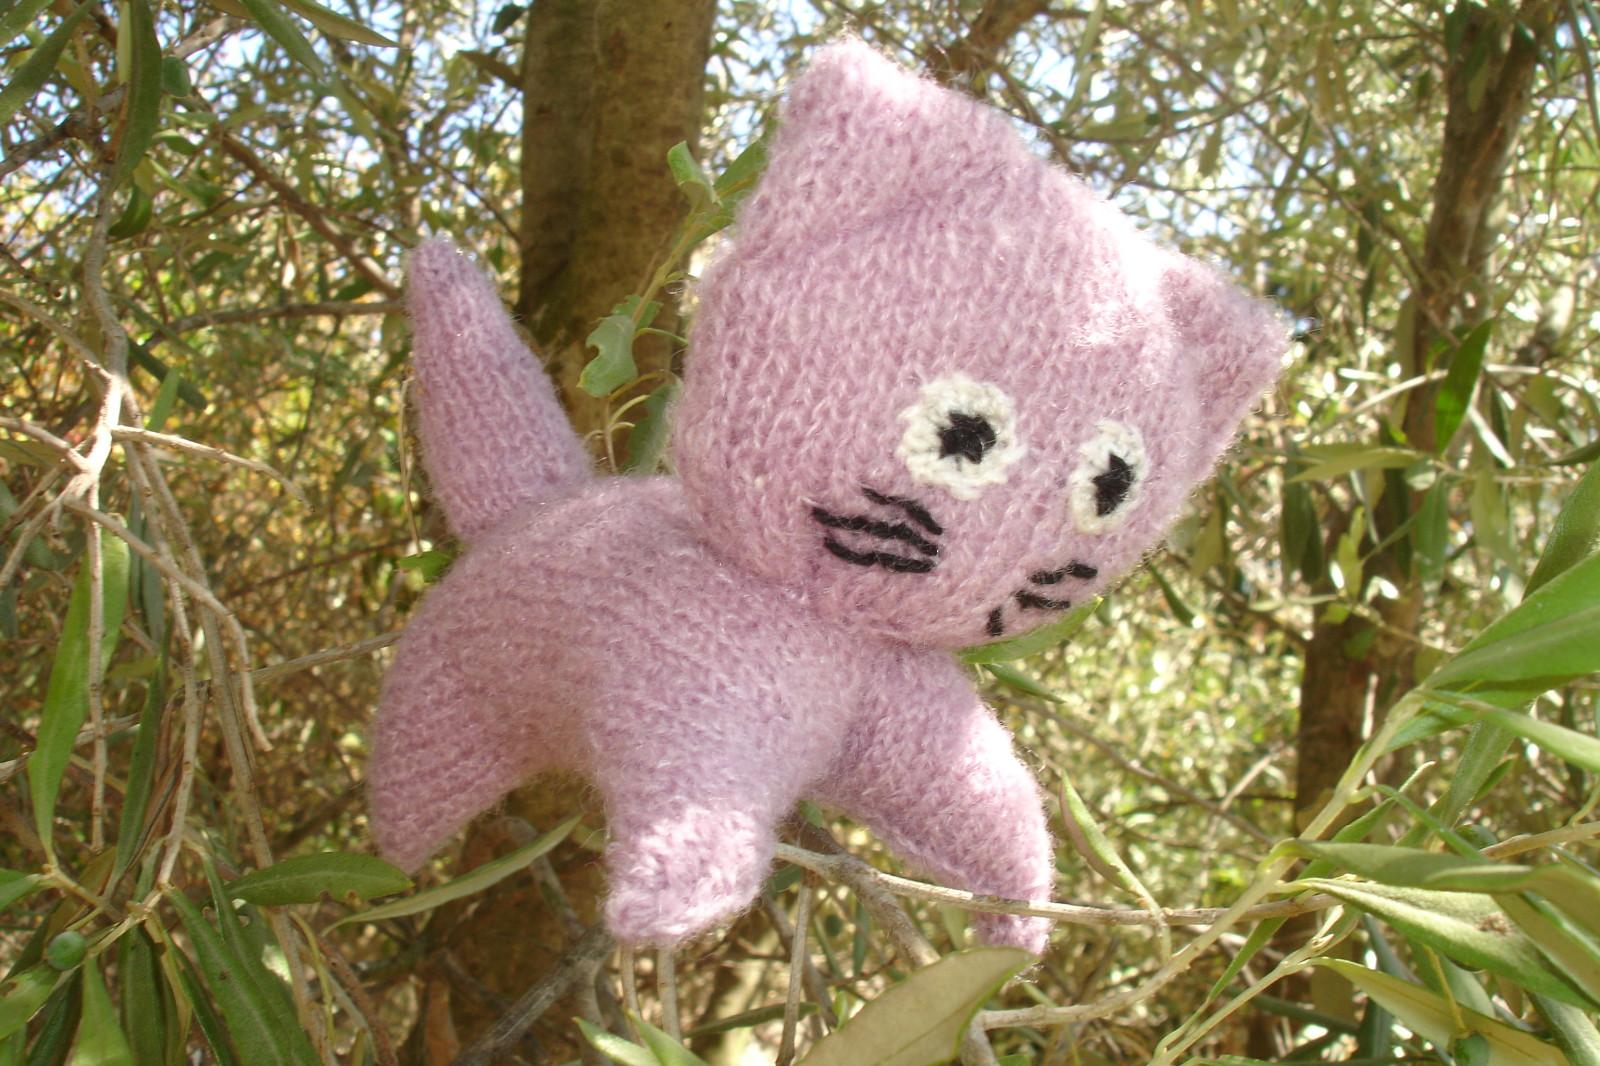 Tuto tricot animaux gratuit